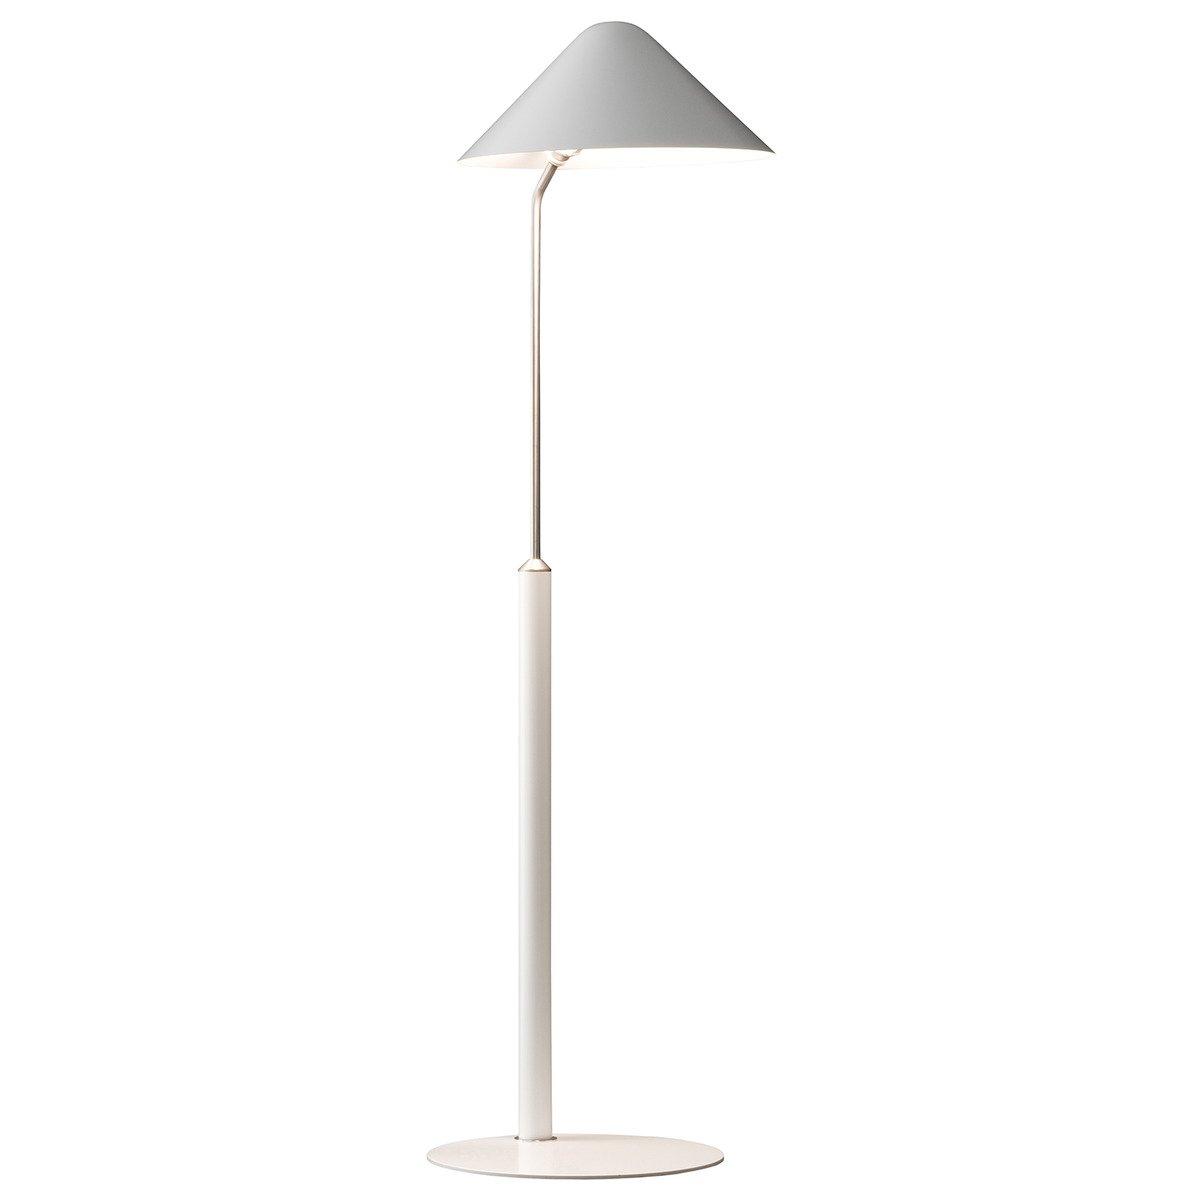 Pandul Floor Vip Floor Lamp, White